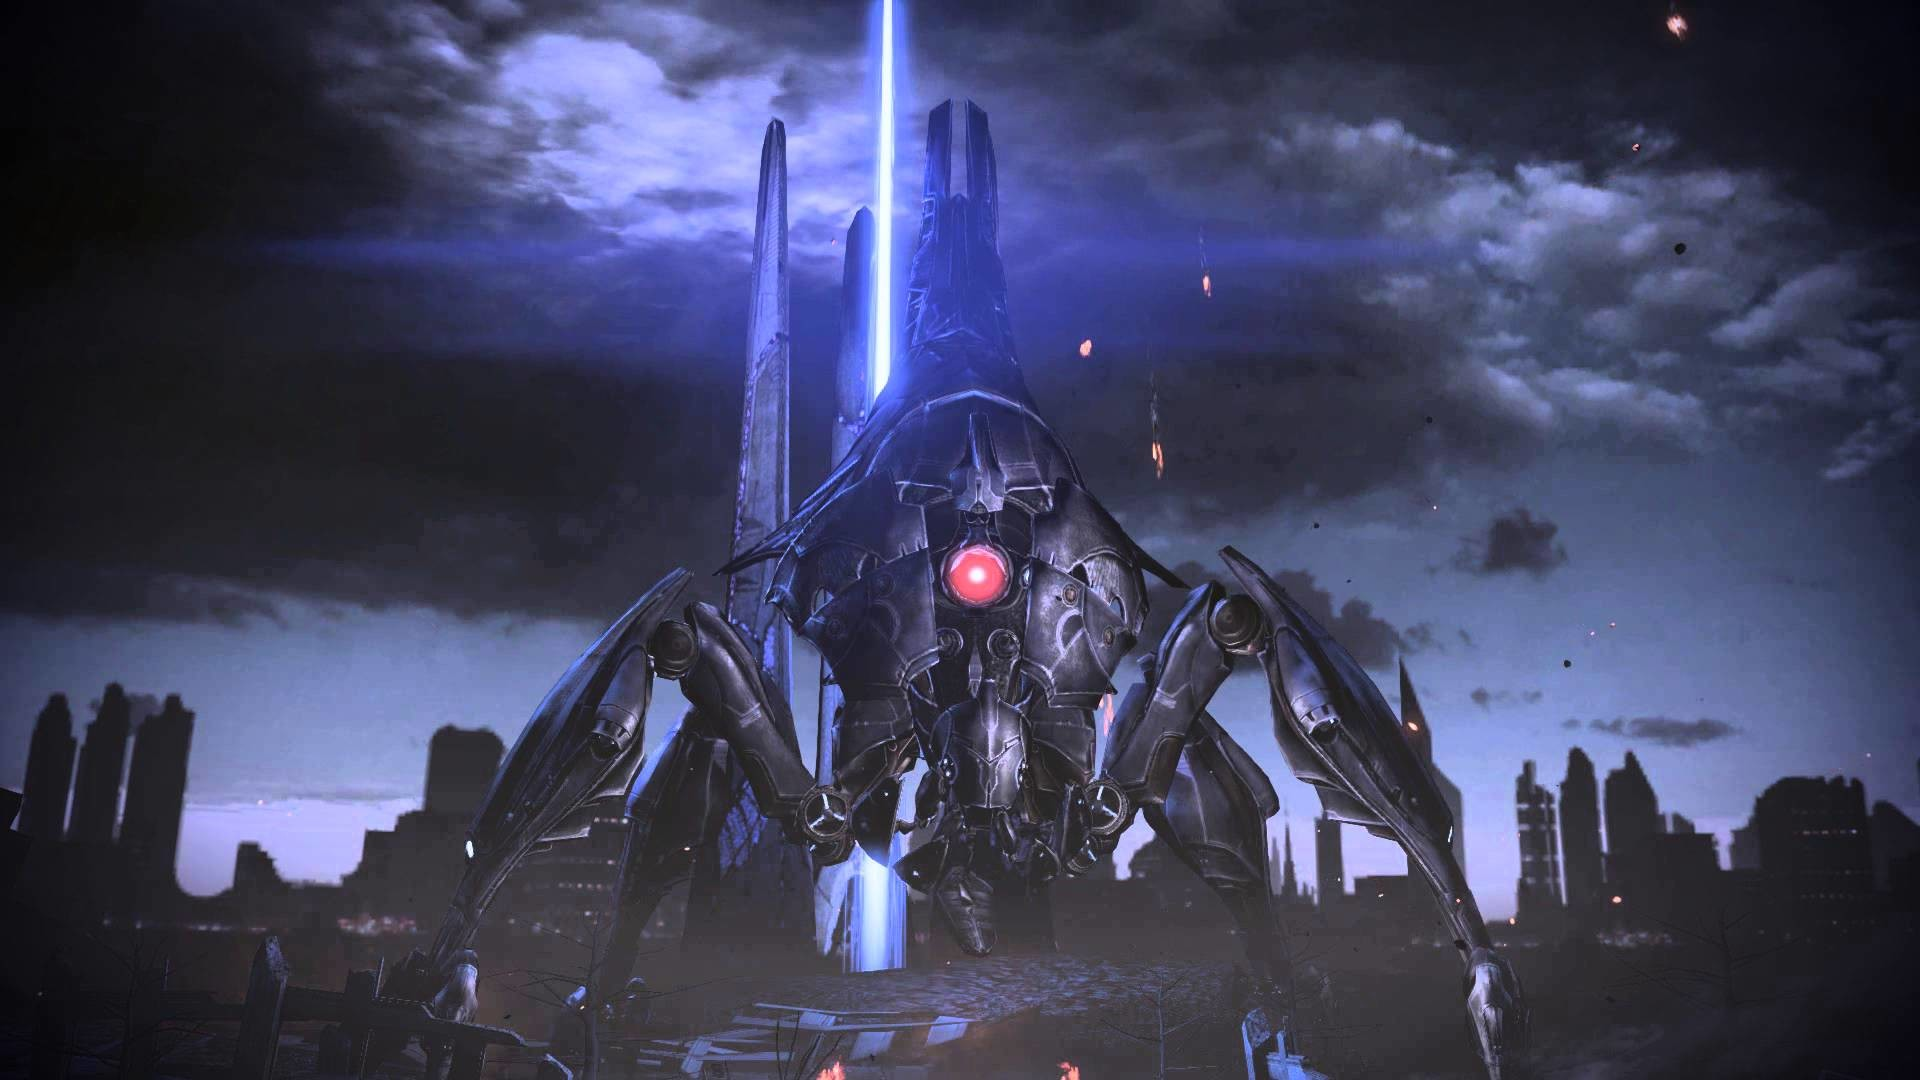 Dreamscene Anime Video Wallpaper Mass Effect Reaper Wallpaper 183 ① Wallpapertag